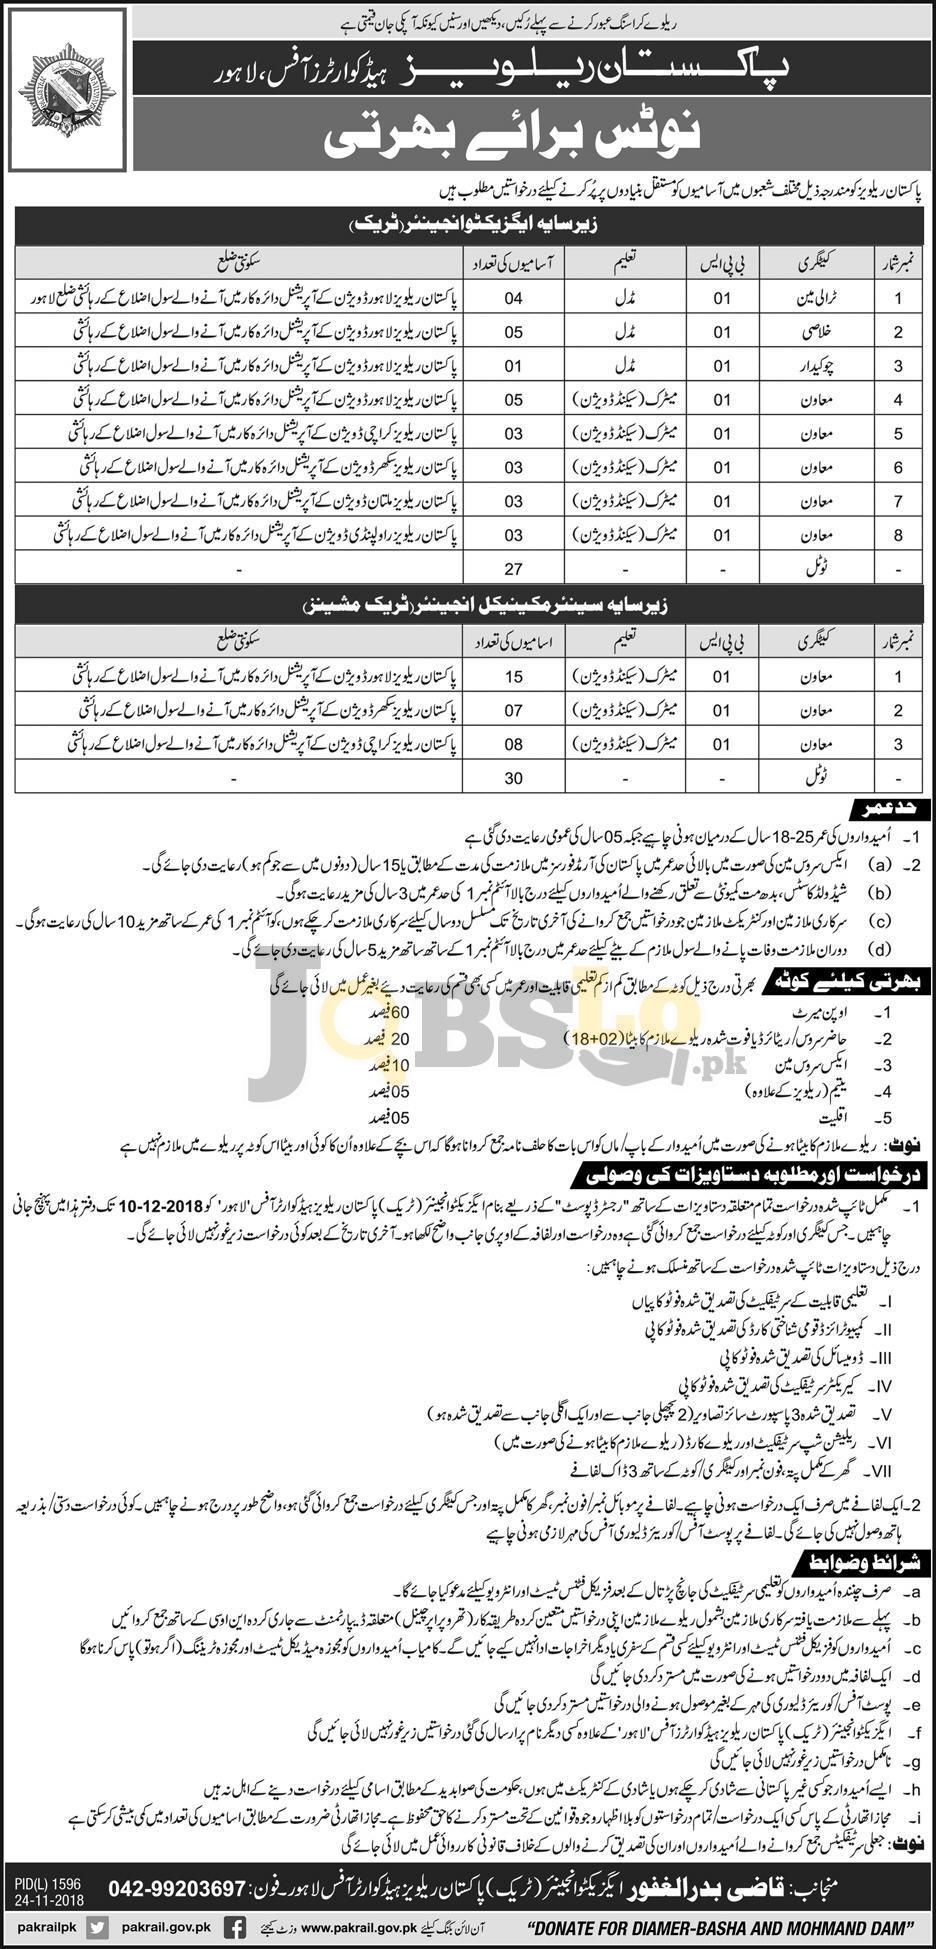 Pakistan Railway Jobs 2018 Lahore Headquarter Latest Vacancies